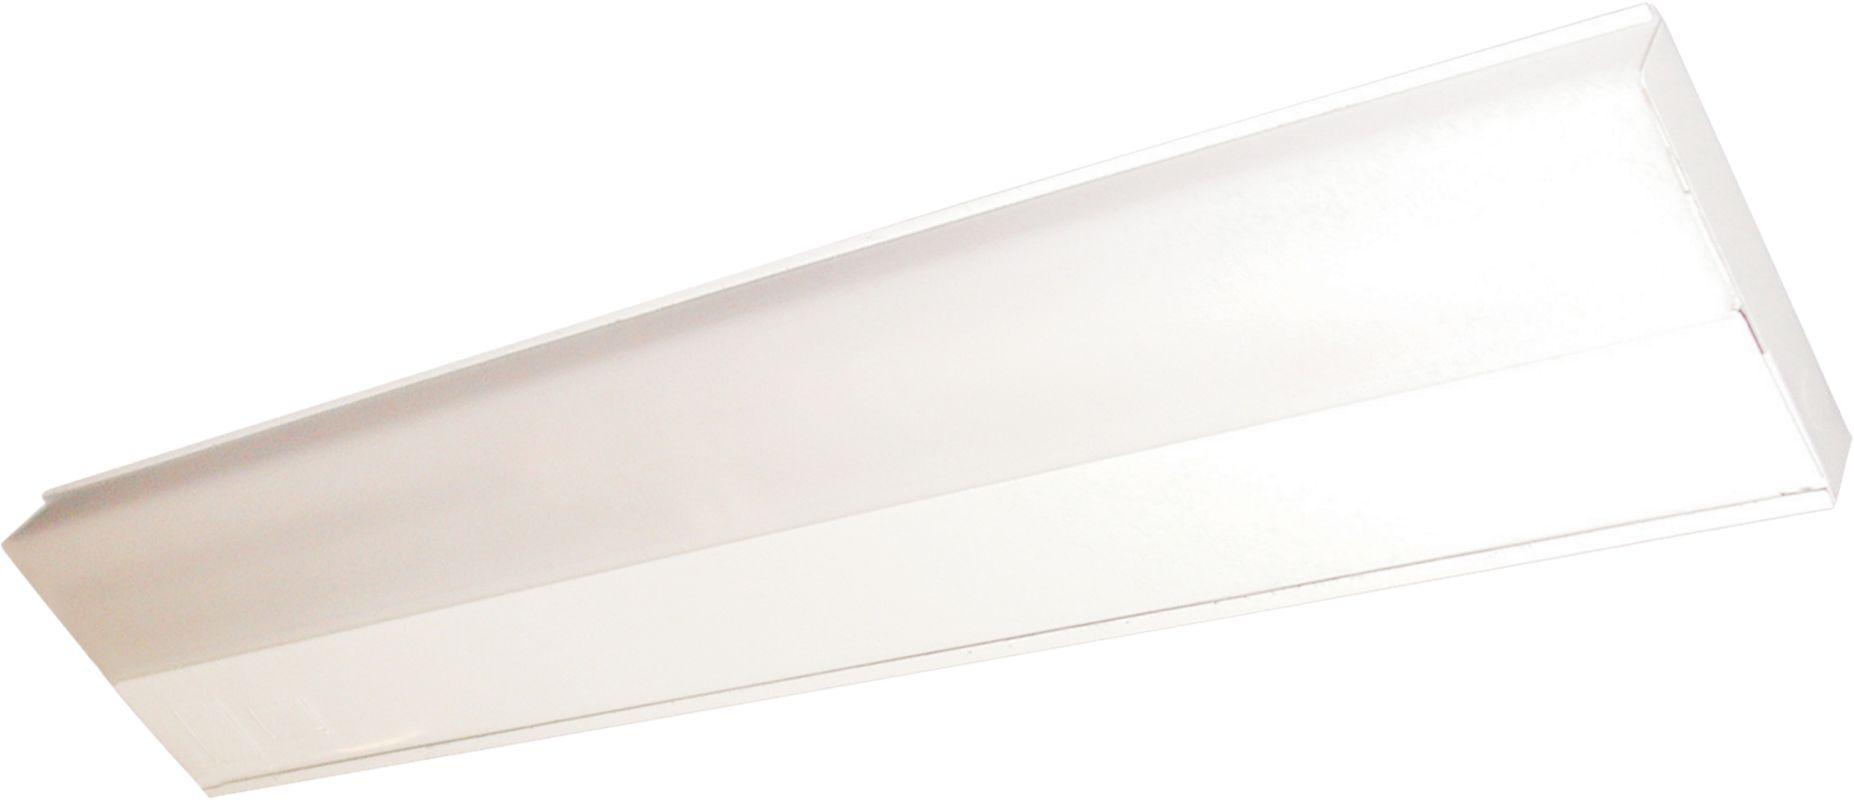 "Maxim 87805 1 Light 12"" Fluorescent Under Cabinet Light from the"